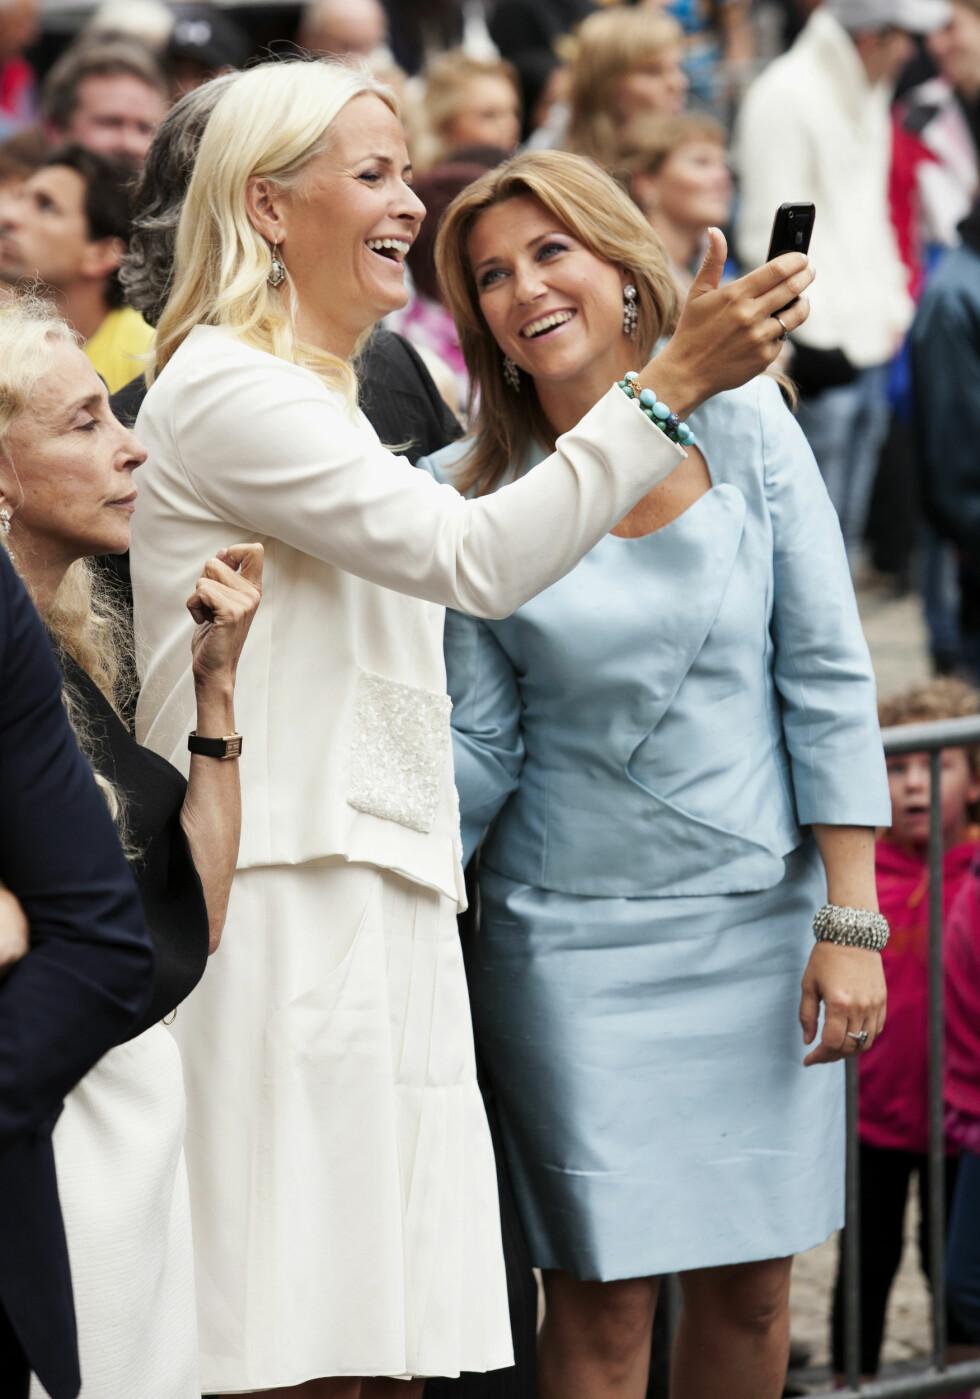 GOD KJEMI: Mette-Marit har tidligere hyllet Märtha for hennes varme hender. Her er de to svigerinnene sammen på kronprinsparets 10-års bryllupsdag. Foto: Se og Hør